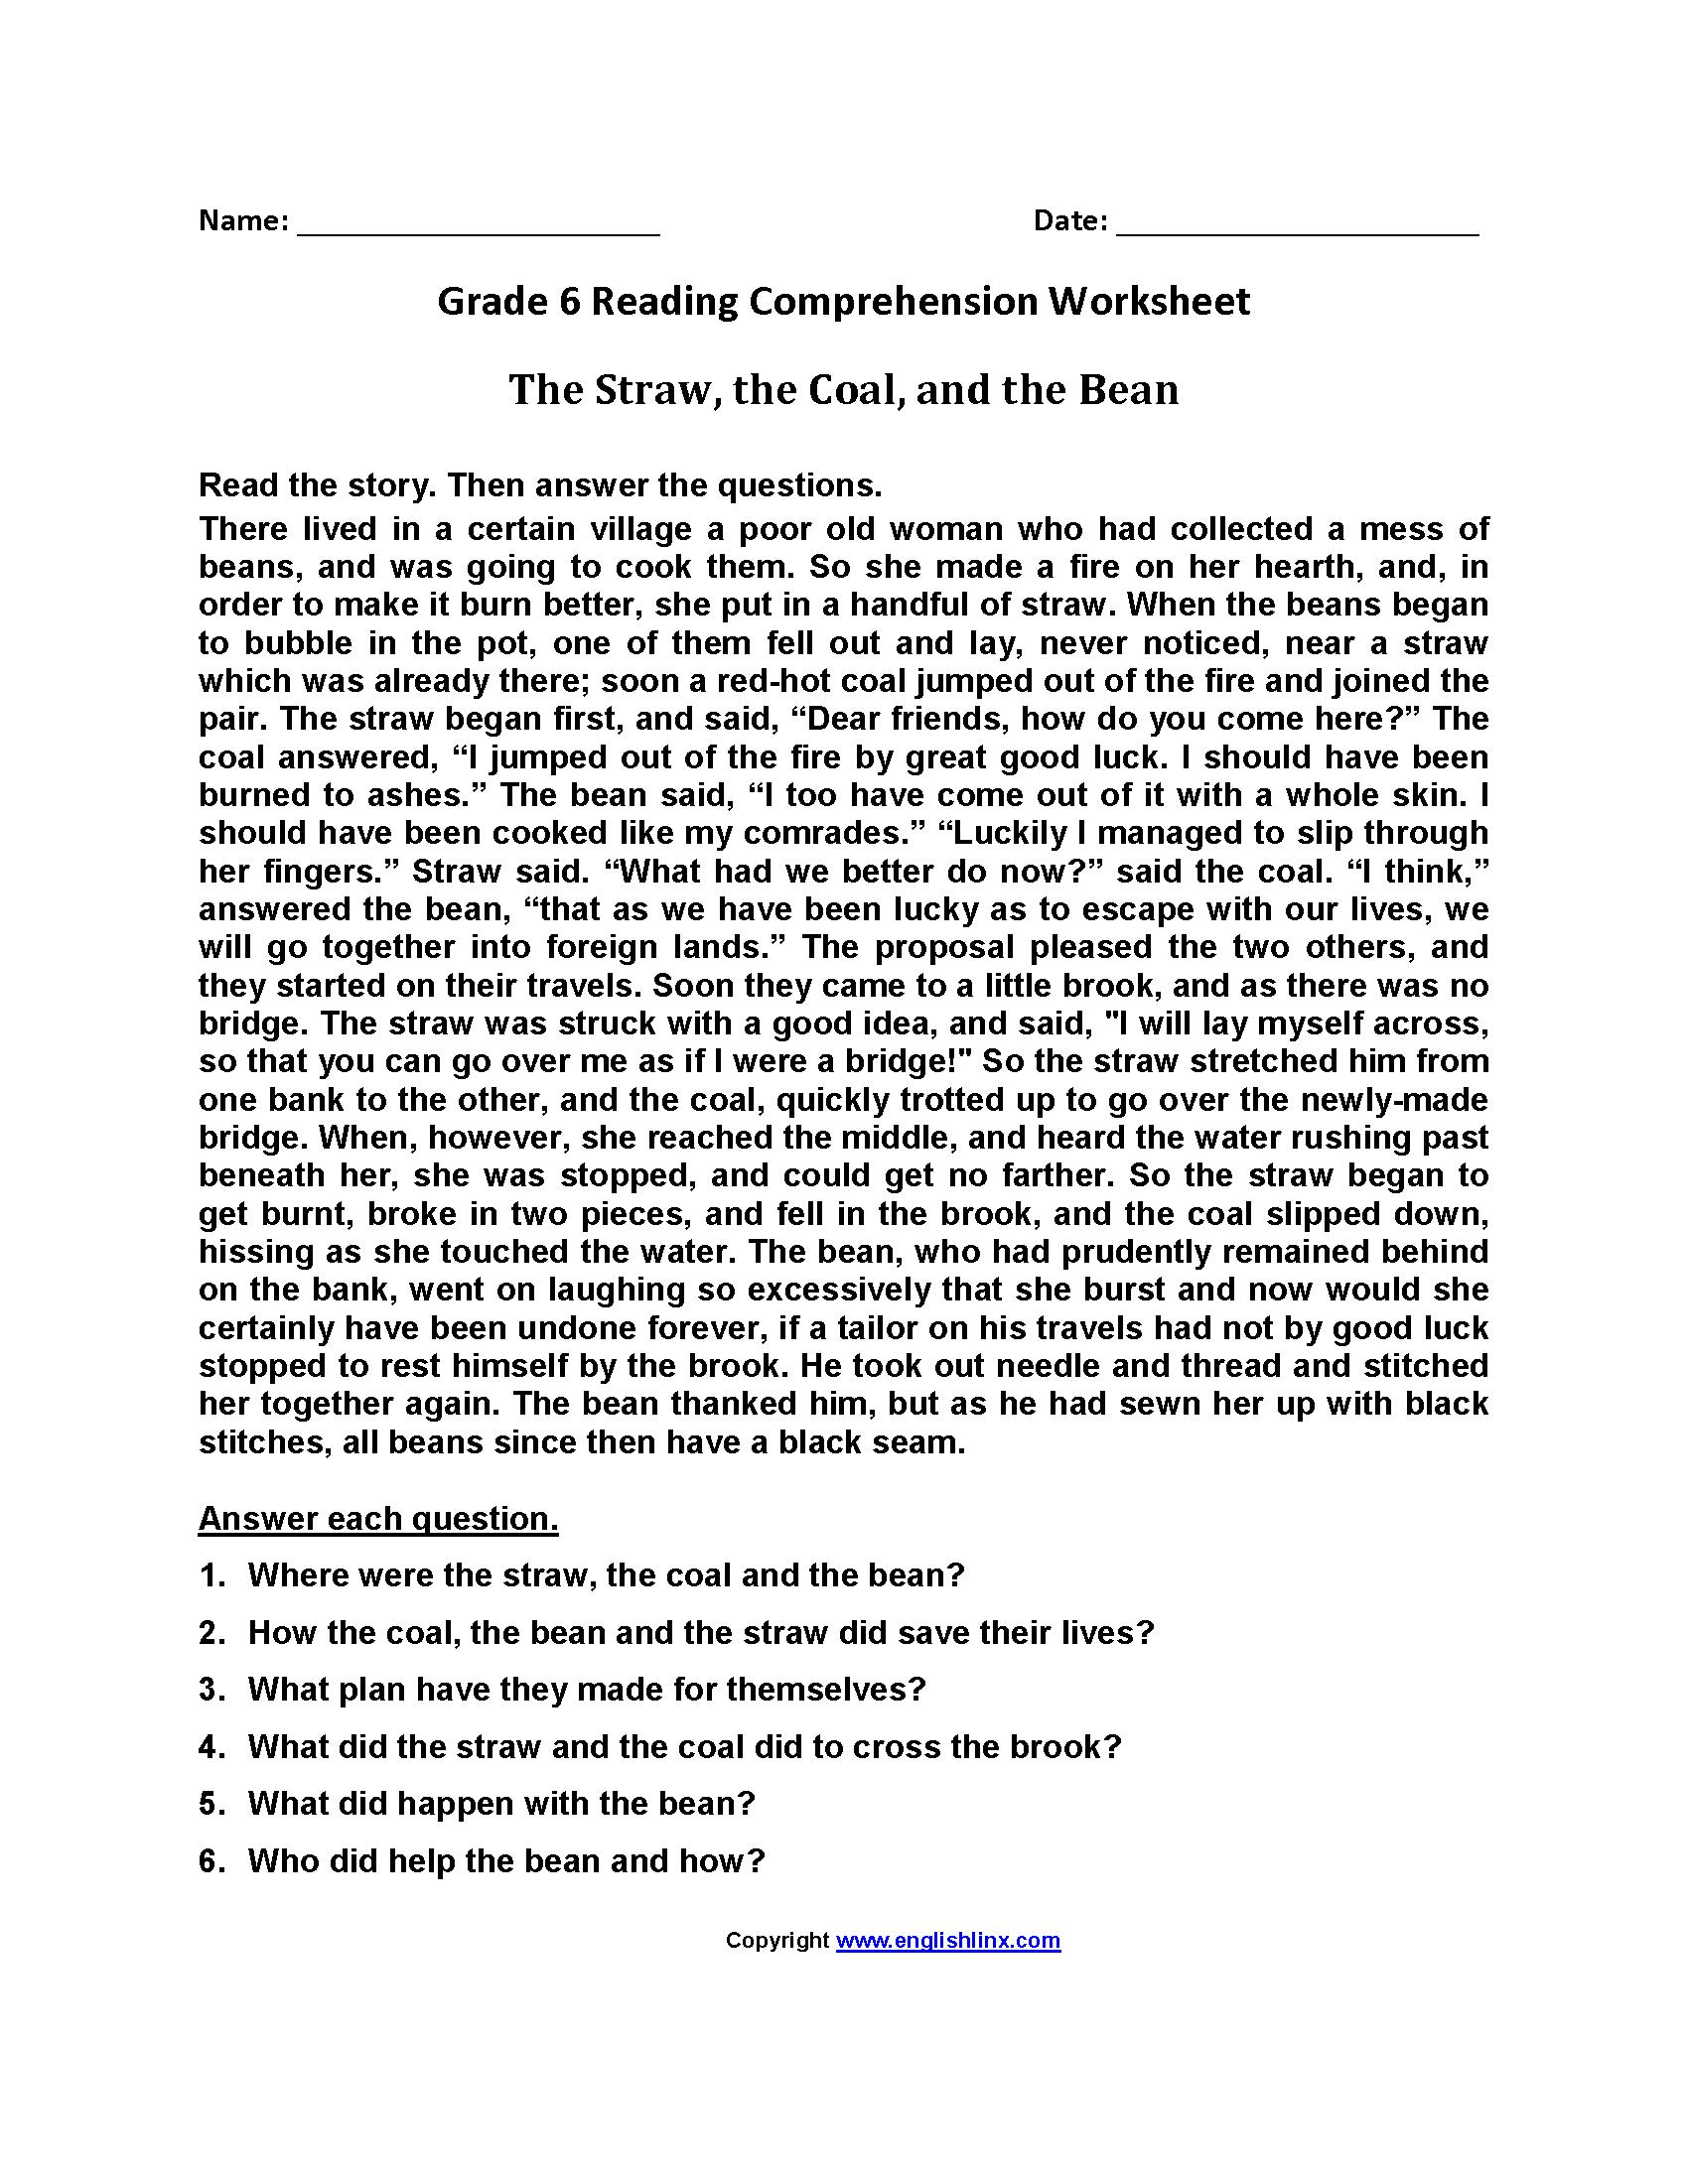 The Straw Coal and Bean\u003cbr\u003eSixth Grade Reading Worksheets   Reading comprehension  worksheets [ 2200 x 1700 Pixel ]